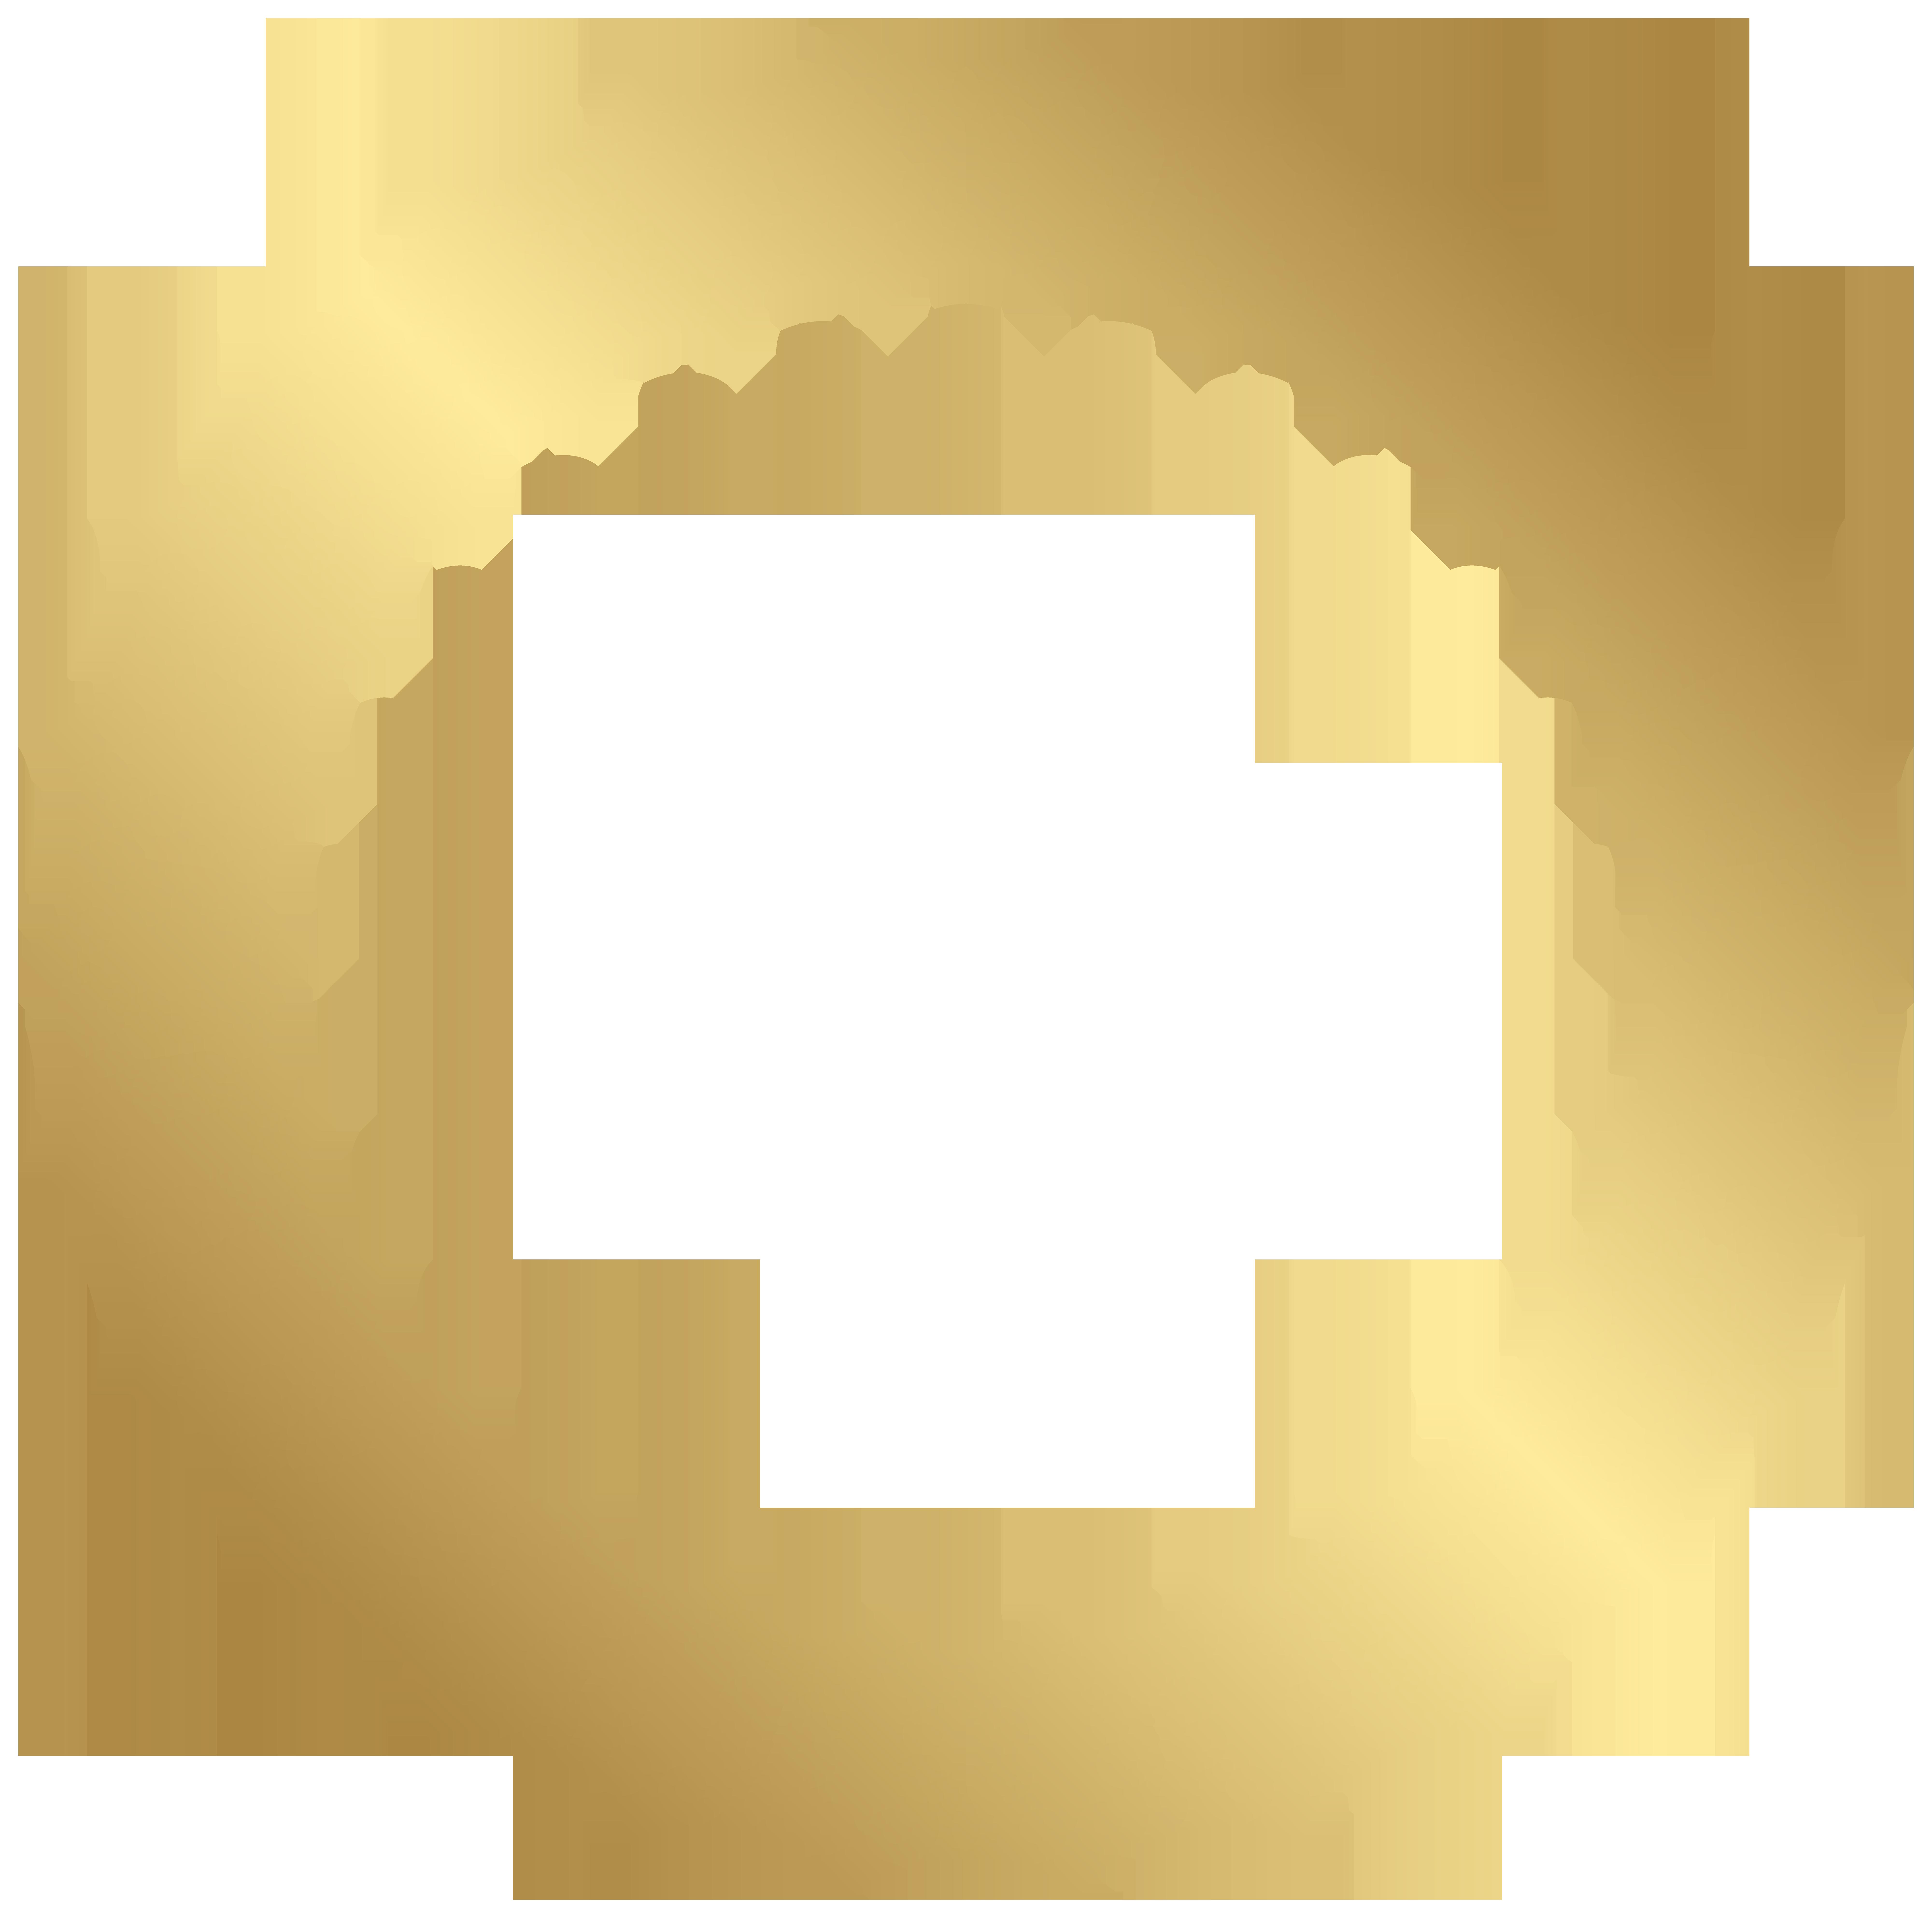 Free Gold Circle Frame Png, Download Free Clip Art, Free.